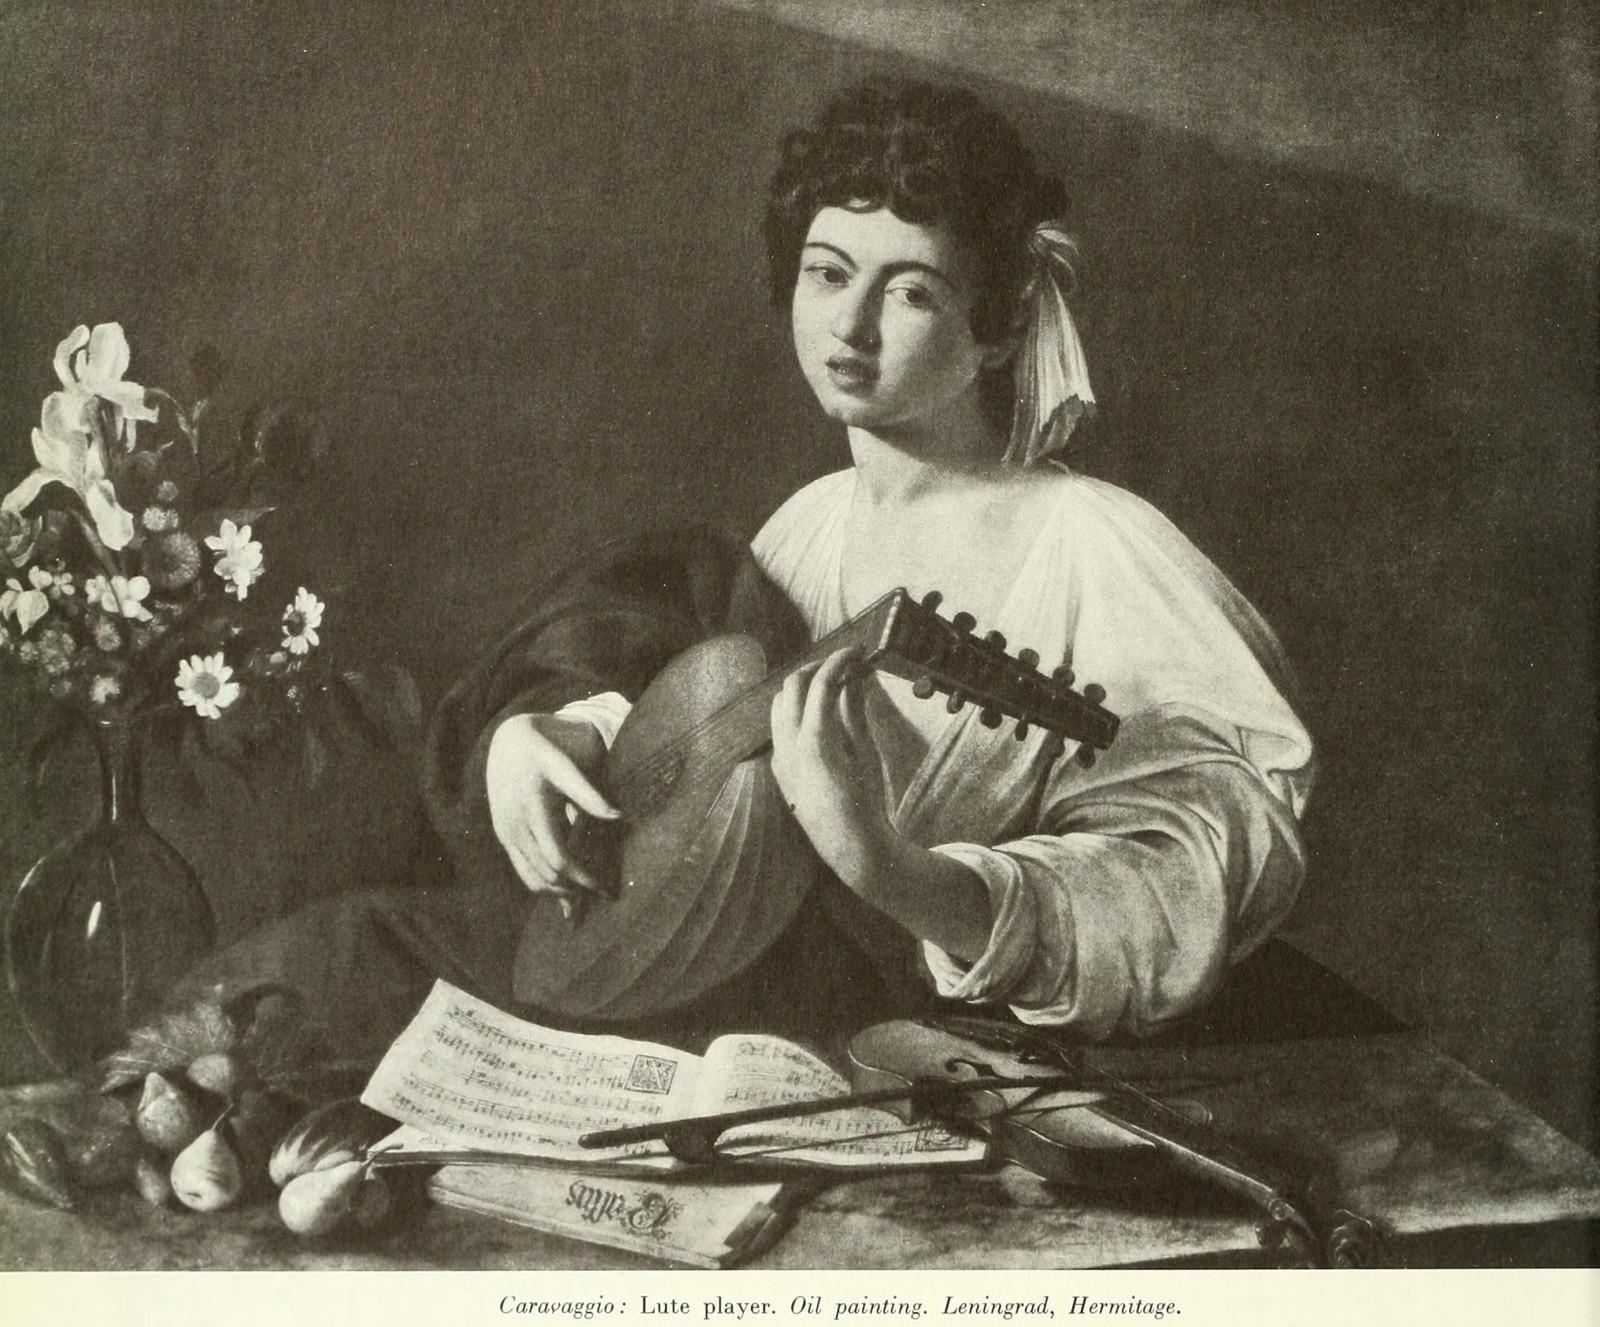 Caravaggio : Lute player. Oil painting. Leningrad, Hermitage.